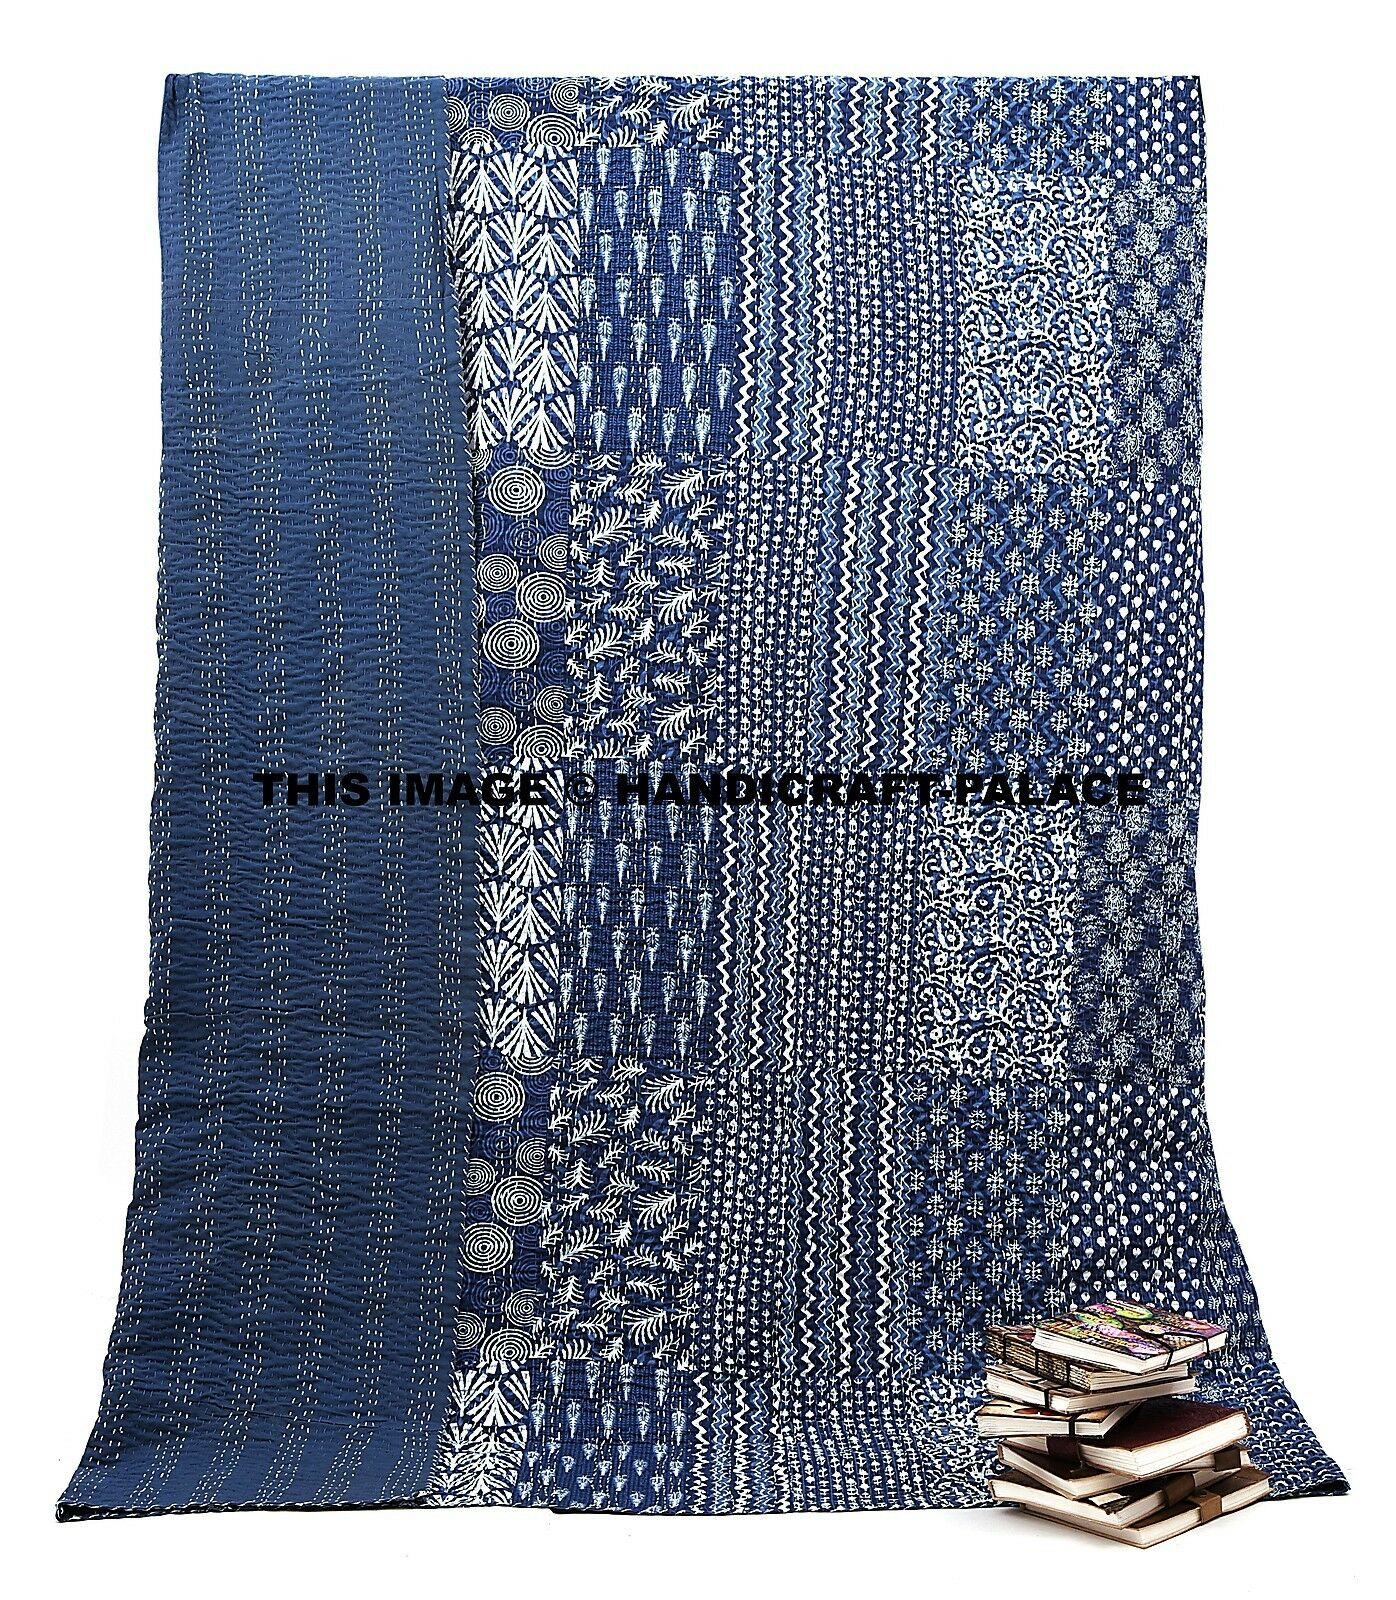 Kantha Quilt Indian Handmade Bed spread Queen Größe Patchwork Cotton Bed Cover